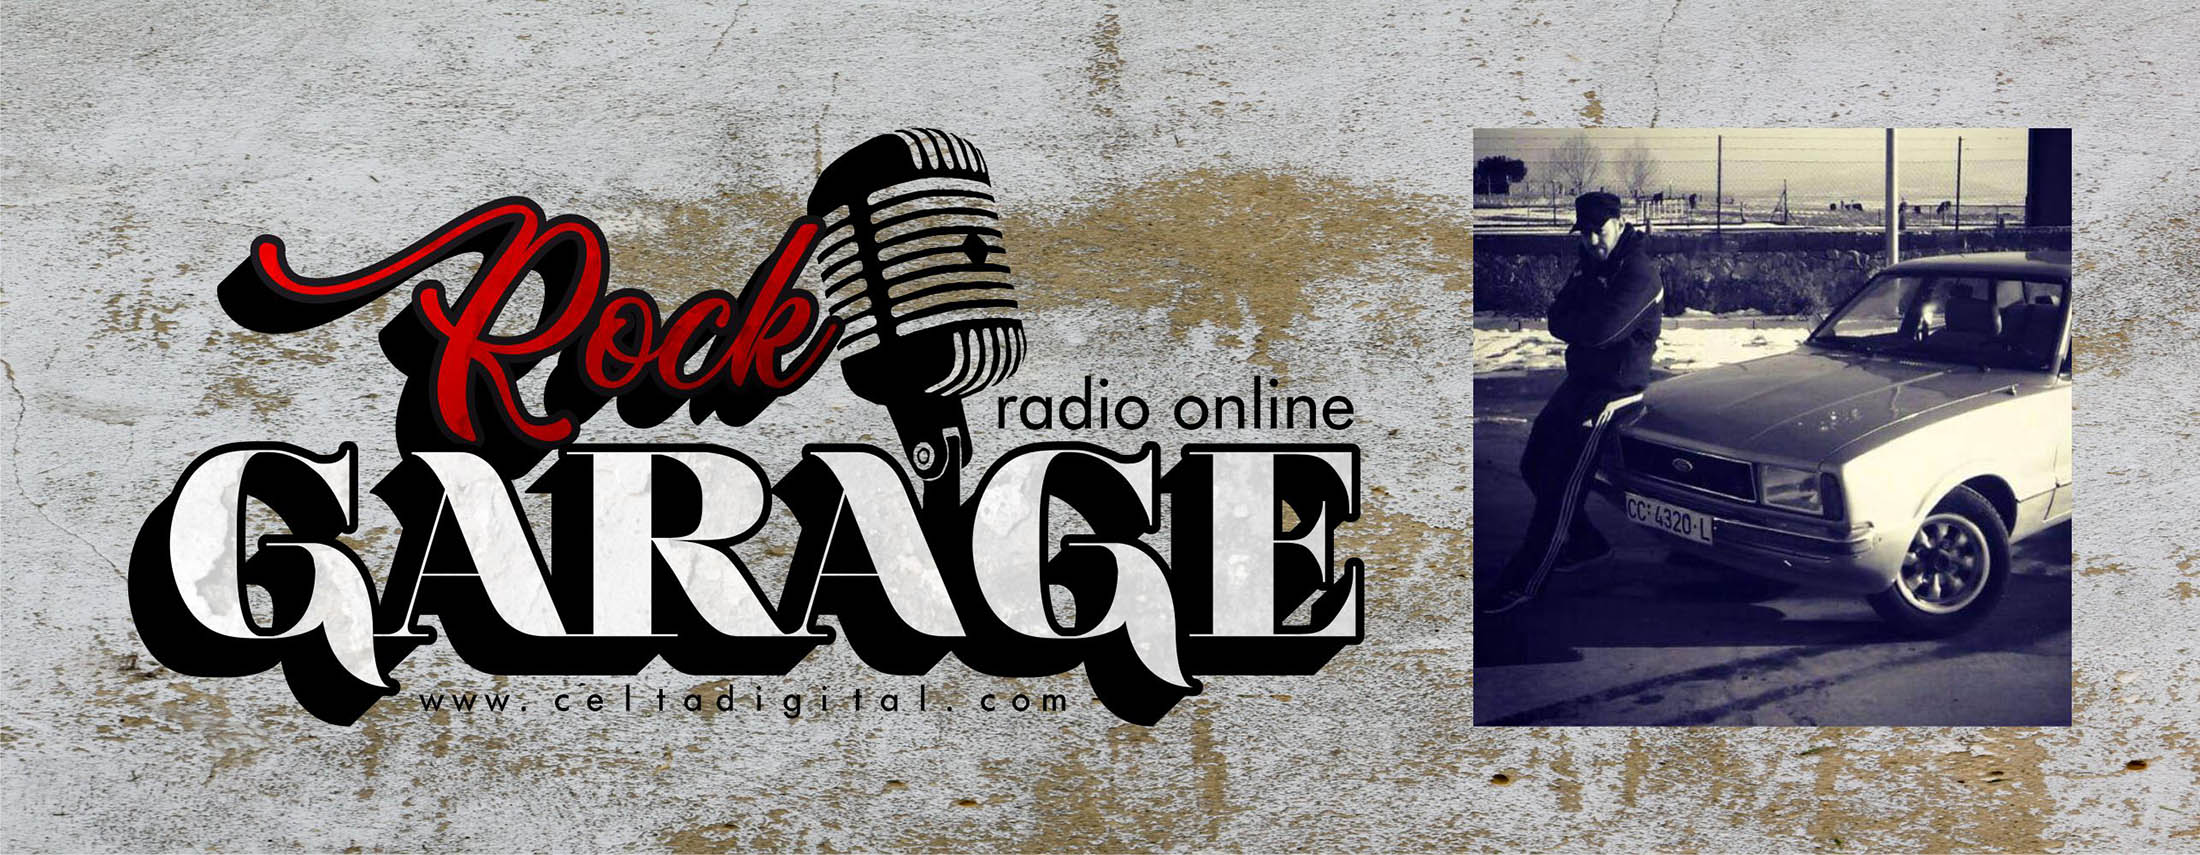 radio online directo rock